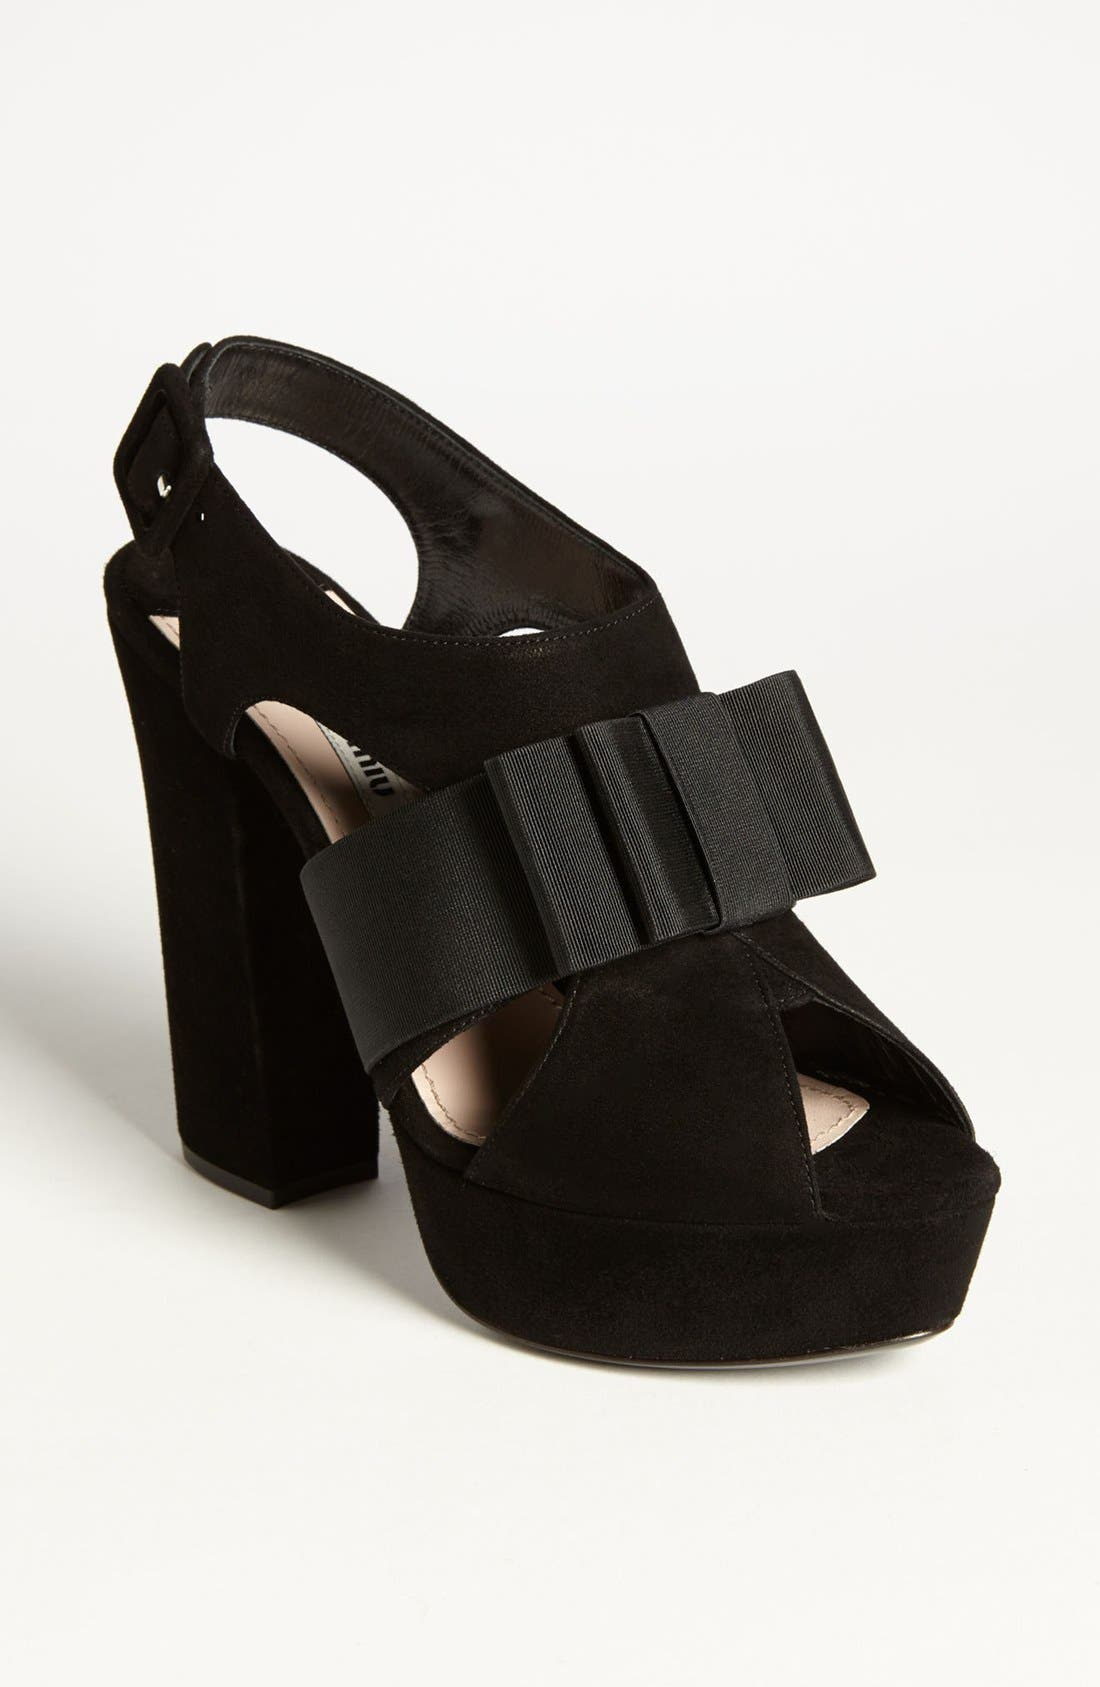 Alternate Image 1 Selected - Miu Miu 'Tuxedo Bow' Sandal